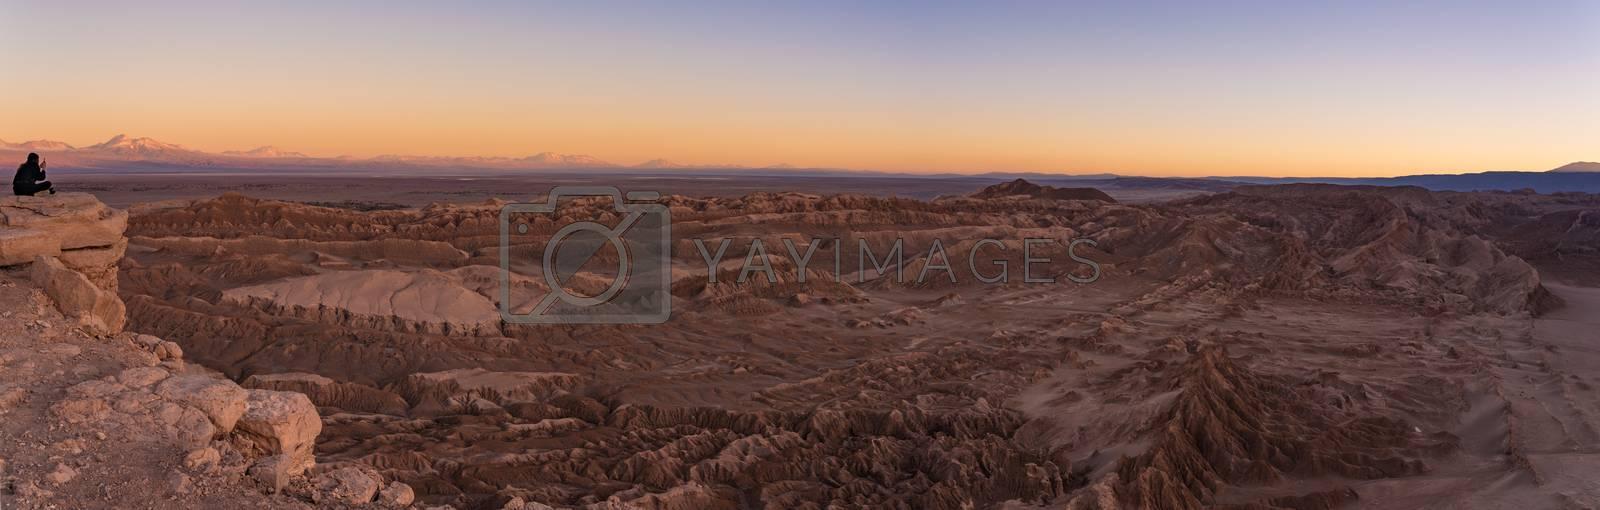 Royalty free image of Sunset at Moon Valley Valle de la luna near San Pedro de Atacama in Chile. by maramade